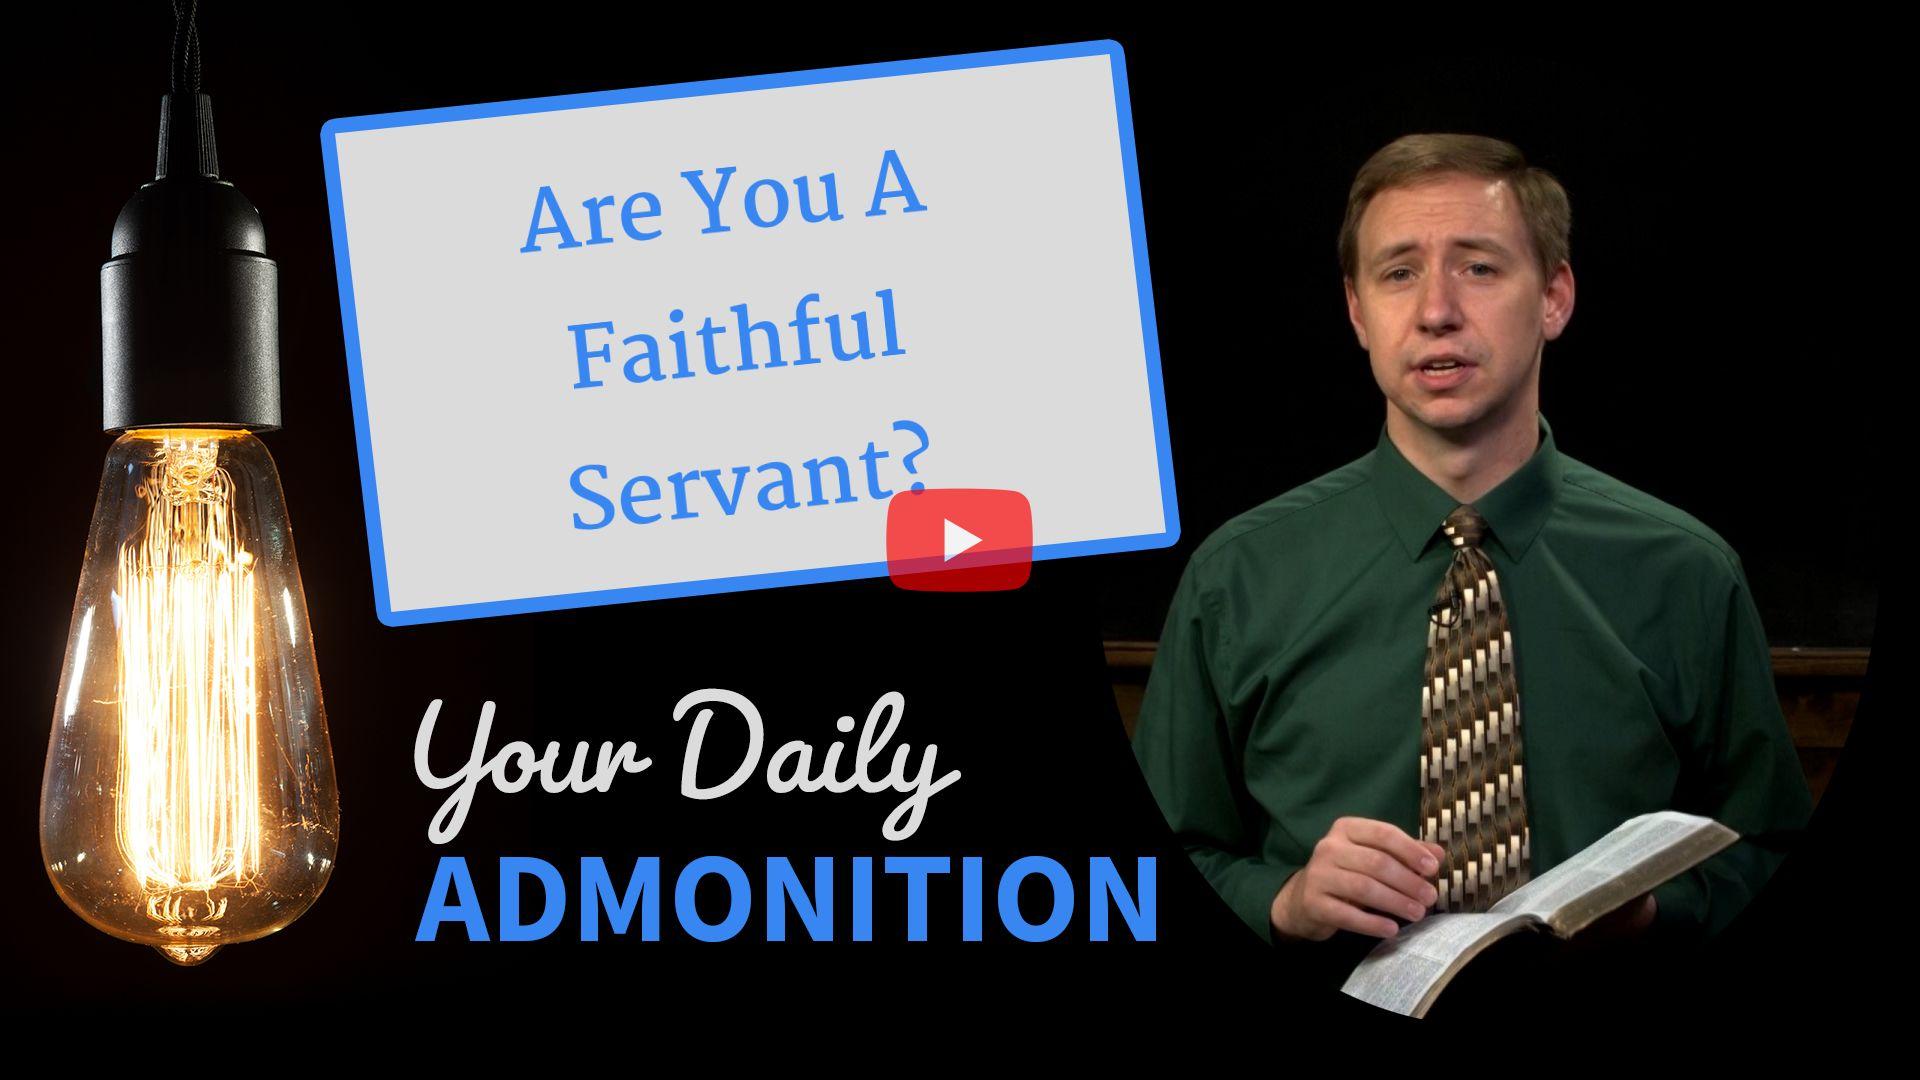 Are You A Faithful Servant?